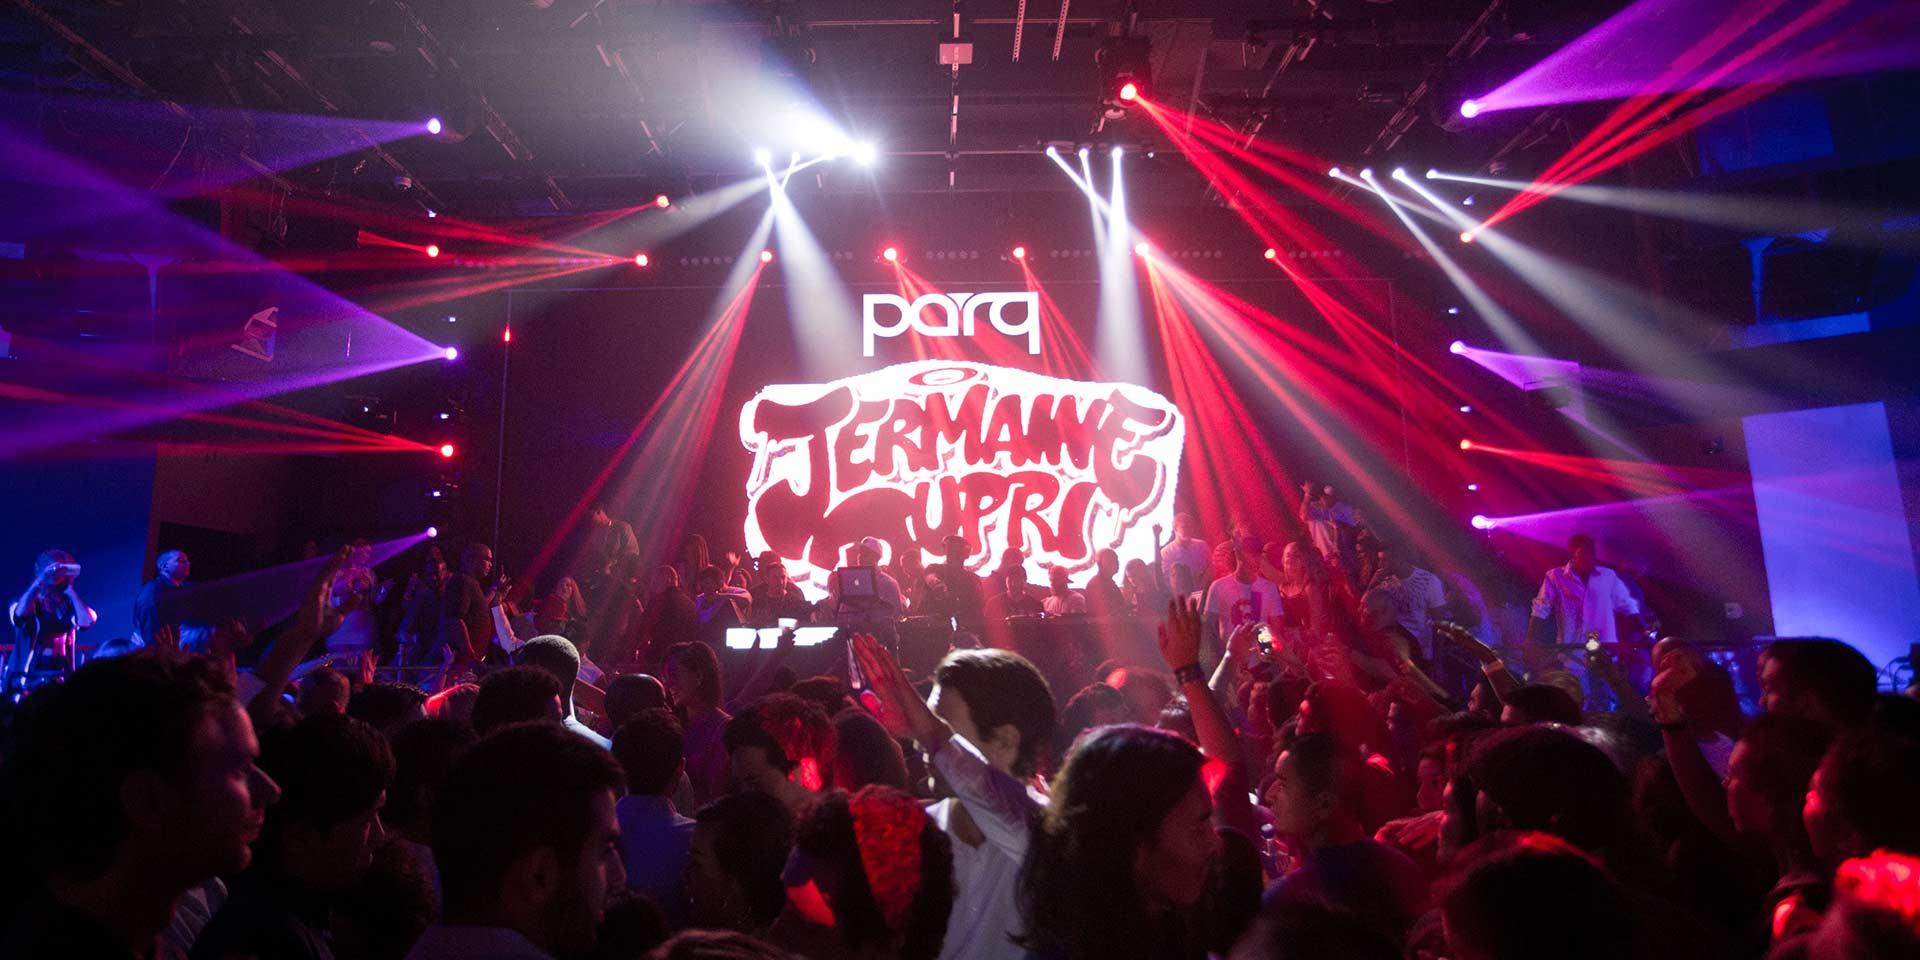 Jermaine Dupri at Parq Nightclub 10/02/15